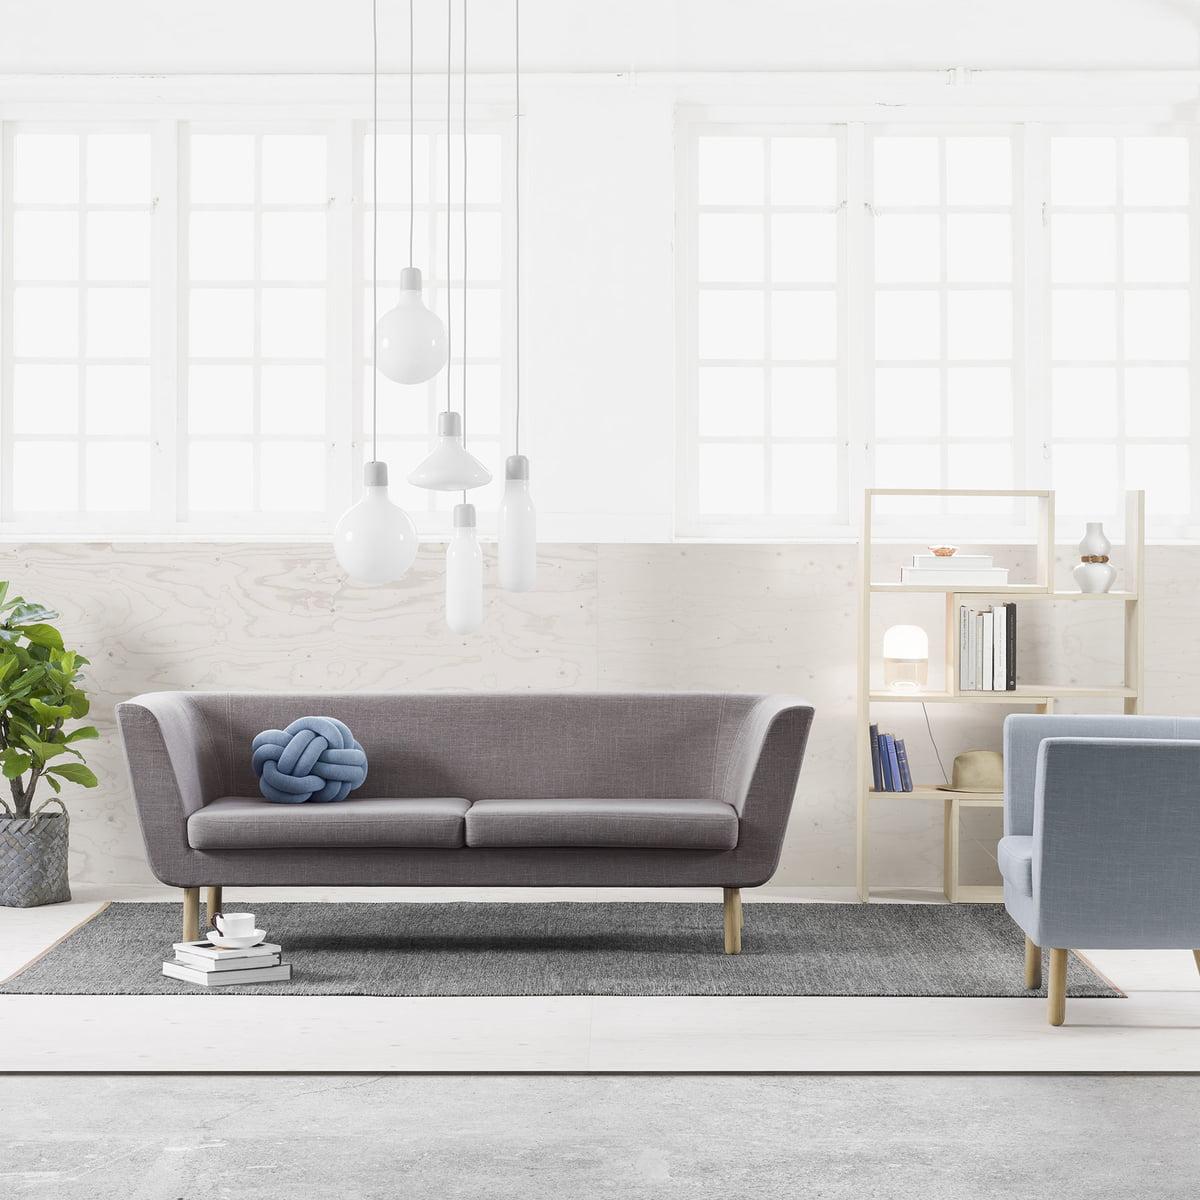 purchase the extend shelf by design house stockholm. Black Bedroom Furniture Sets. Home Design Ideas